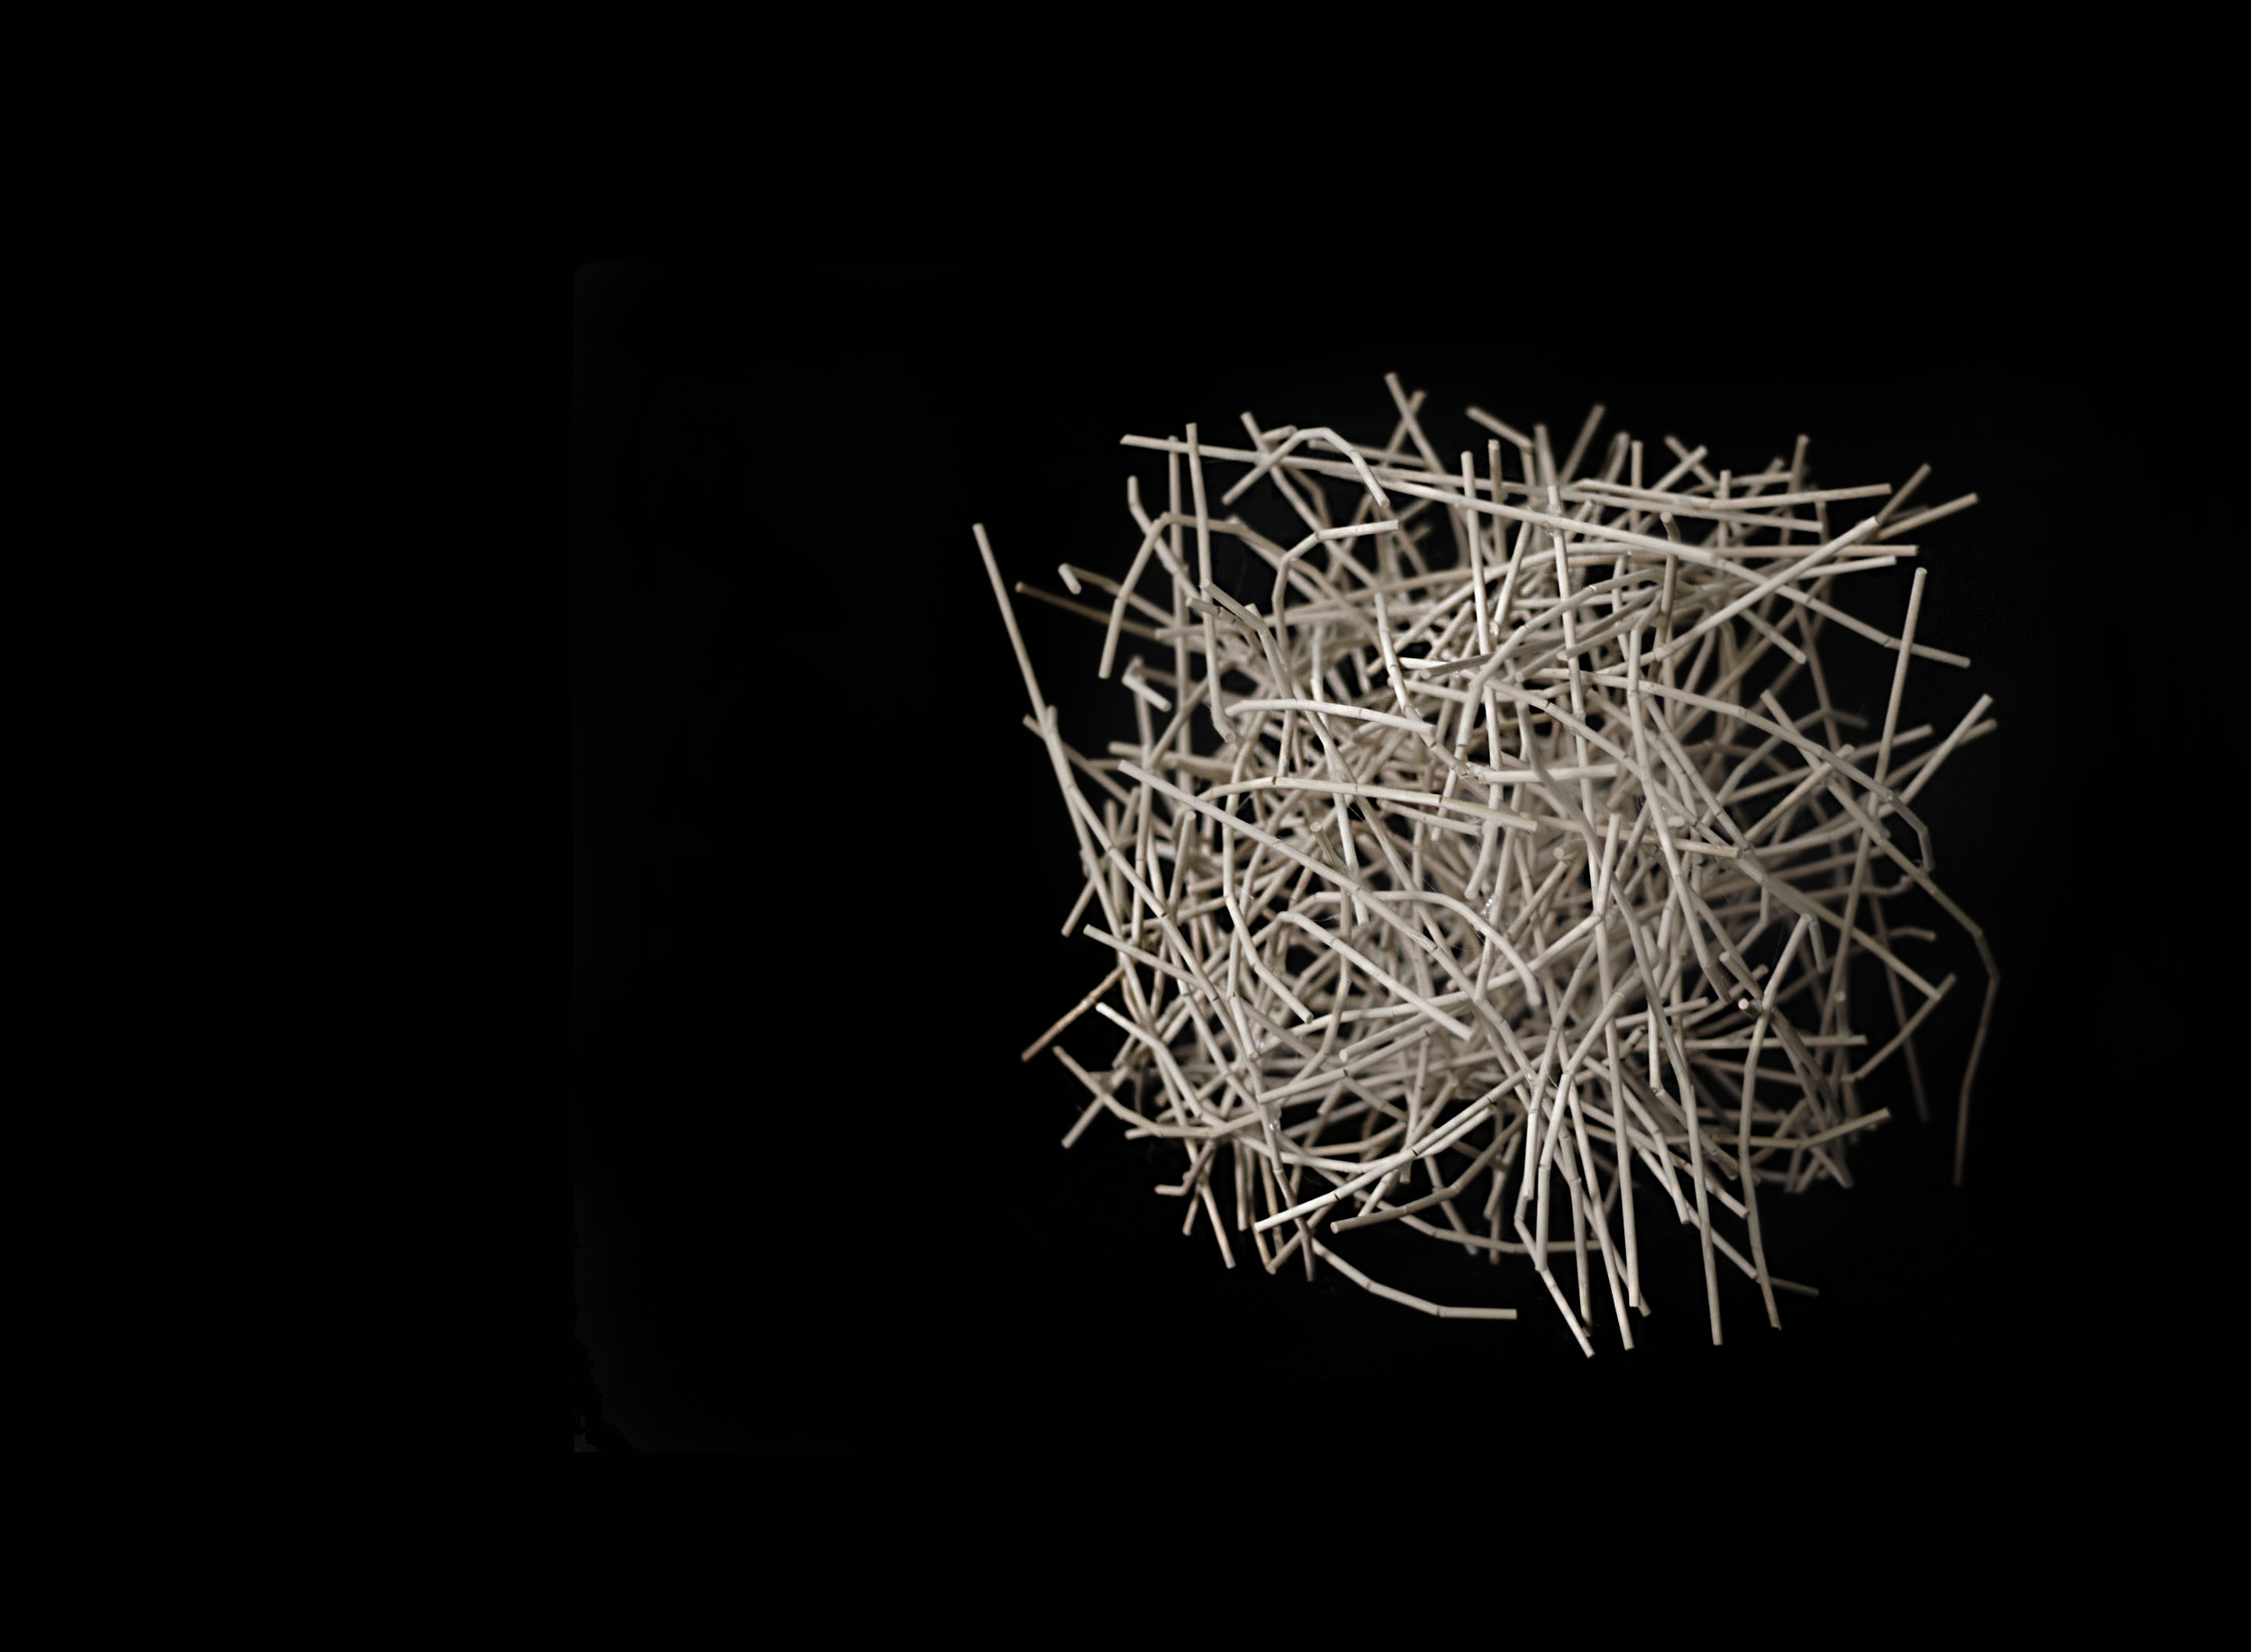 MAKING+MEANING - SCI-Arc, Los Angeles, CA, USA5-week summer program, 2014tutors: Alexis Rochas, Betty Kassis, Jonah Rowen, Russell Thomsen, Emily White